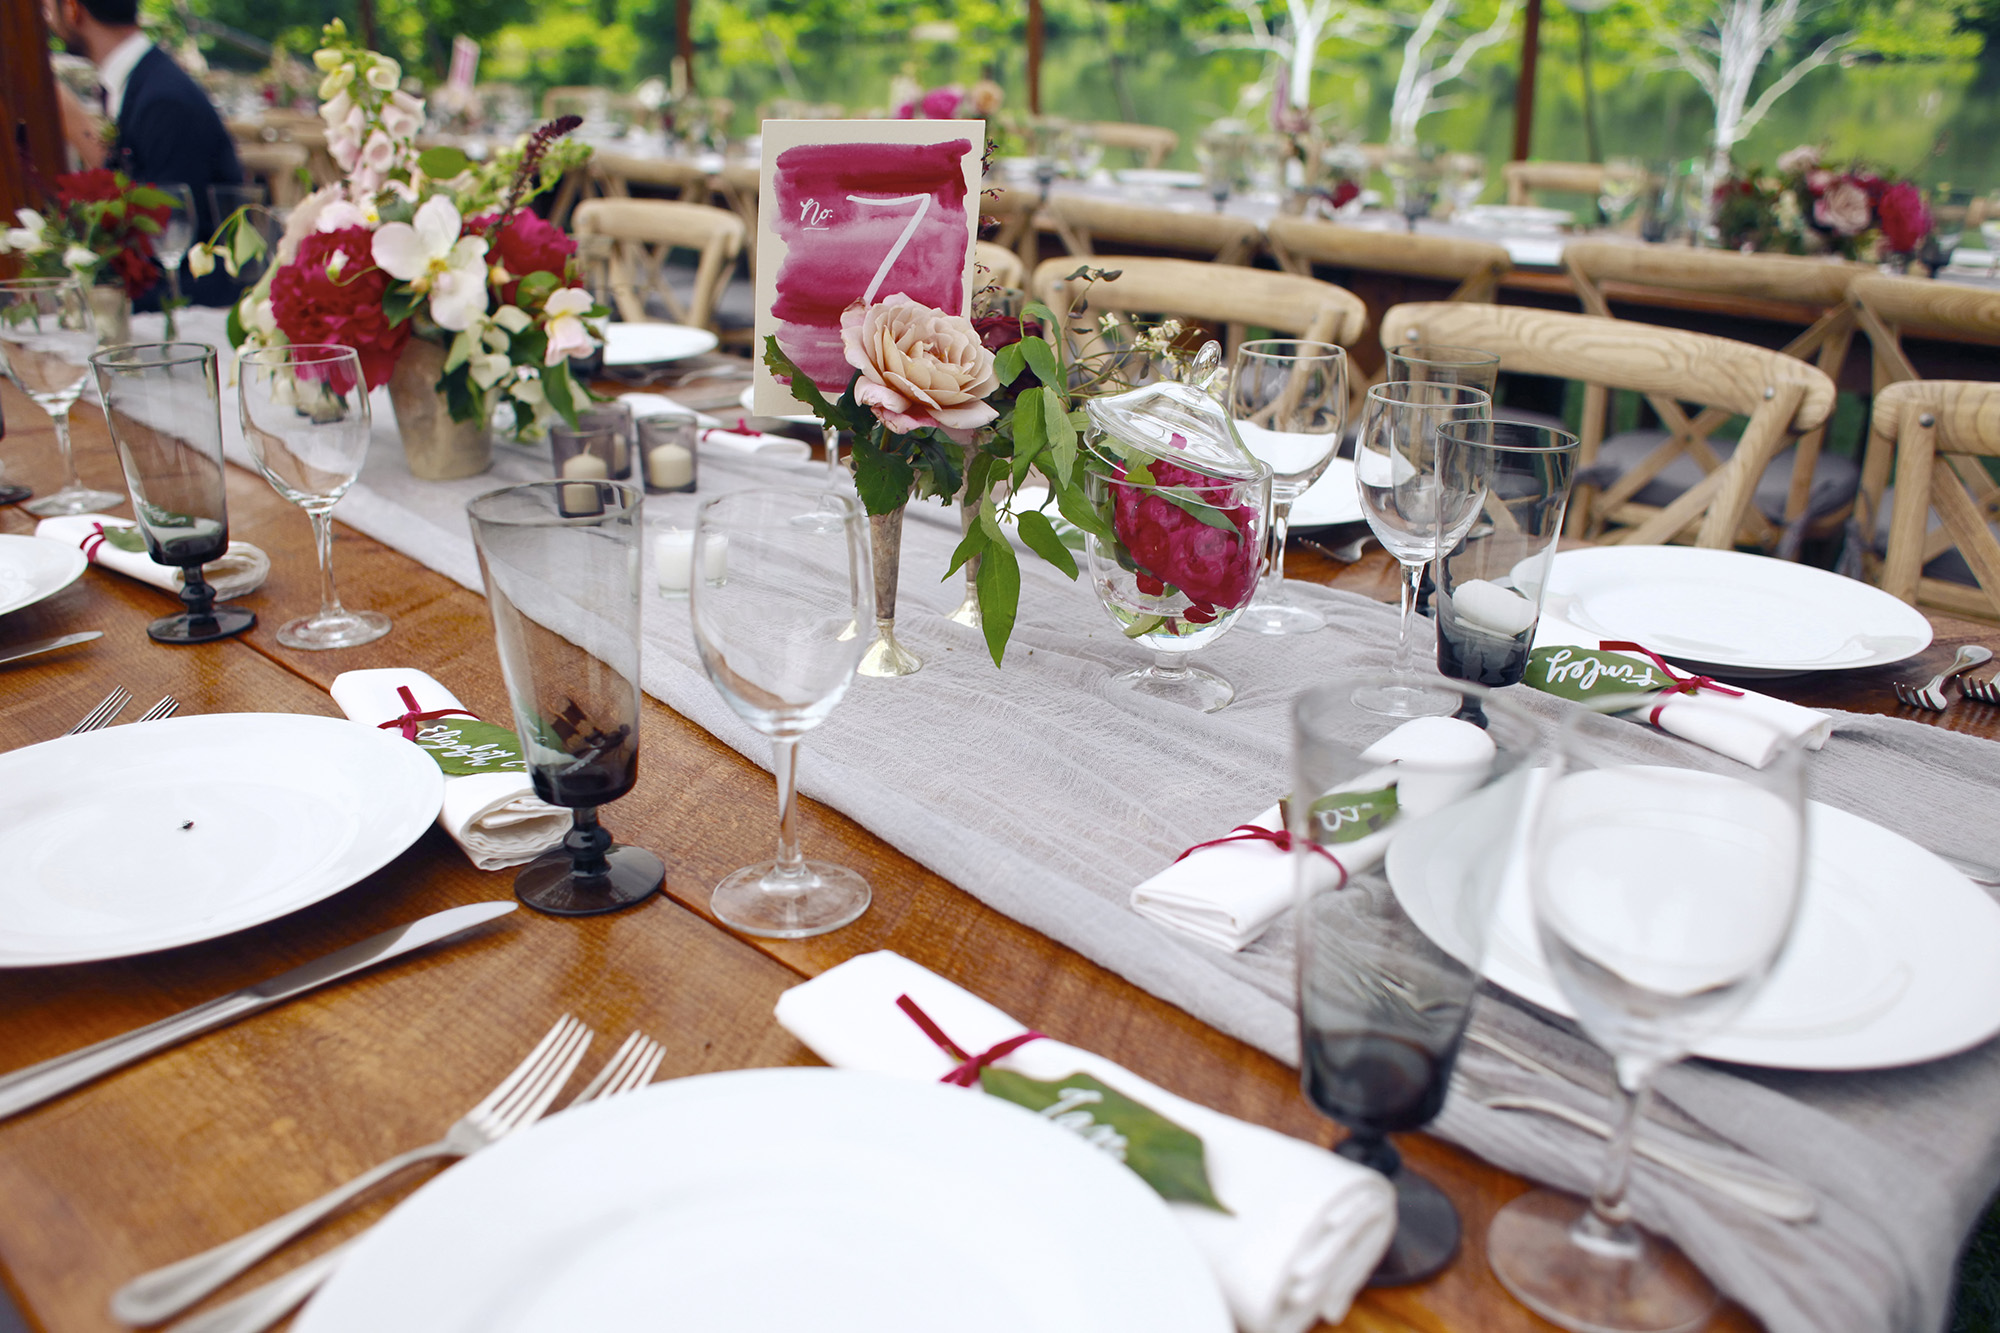 Shannon-Wellington-Delaware-Wedding-Rustic-Home-Wedding14.jpg